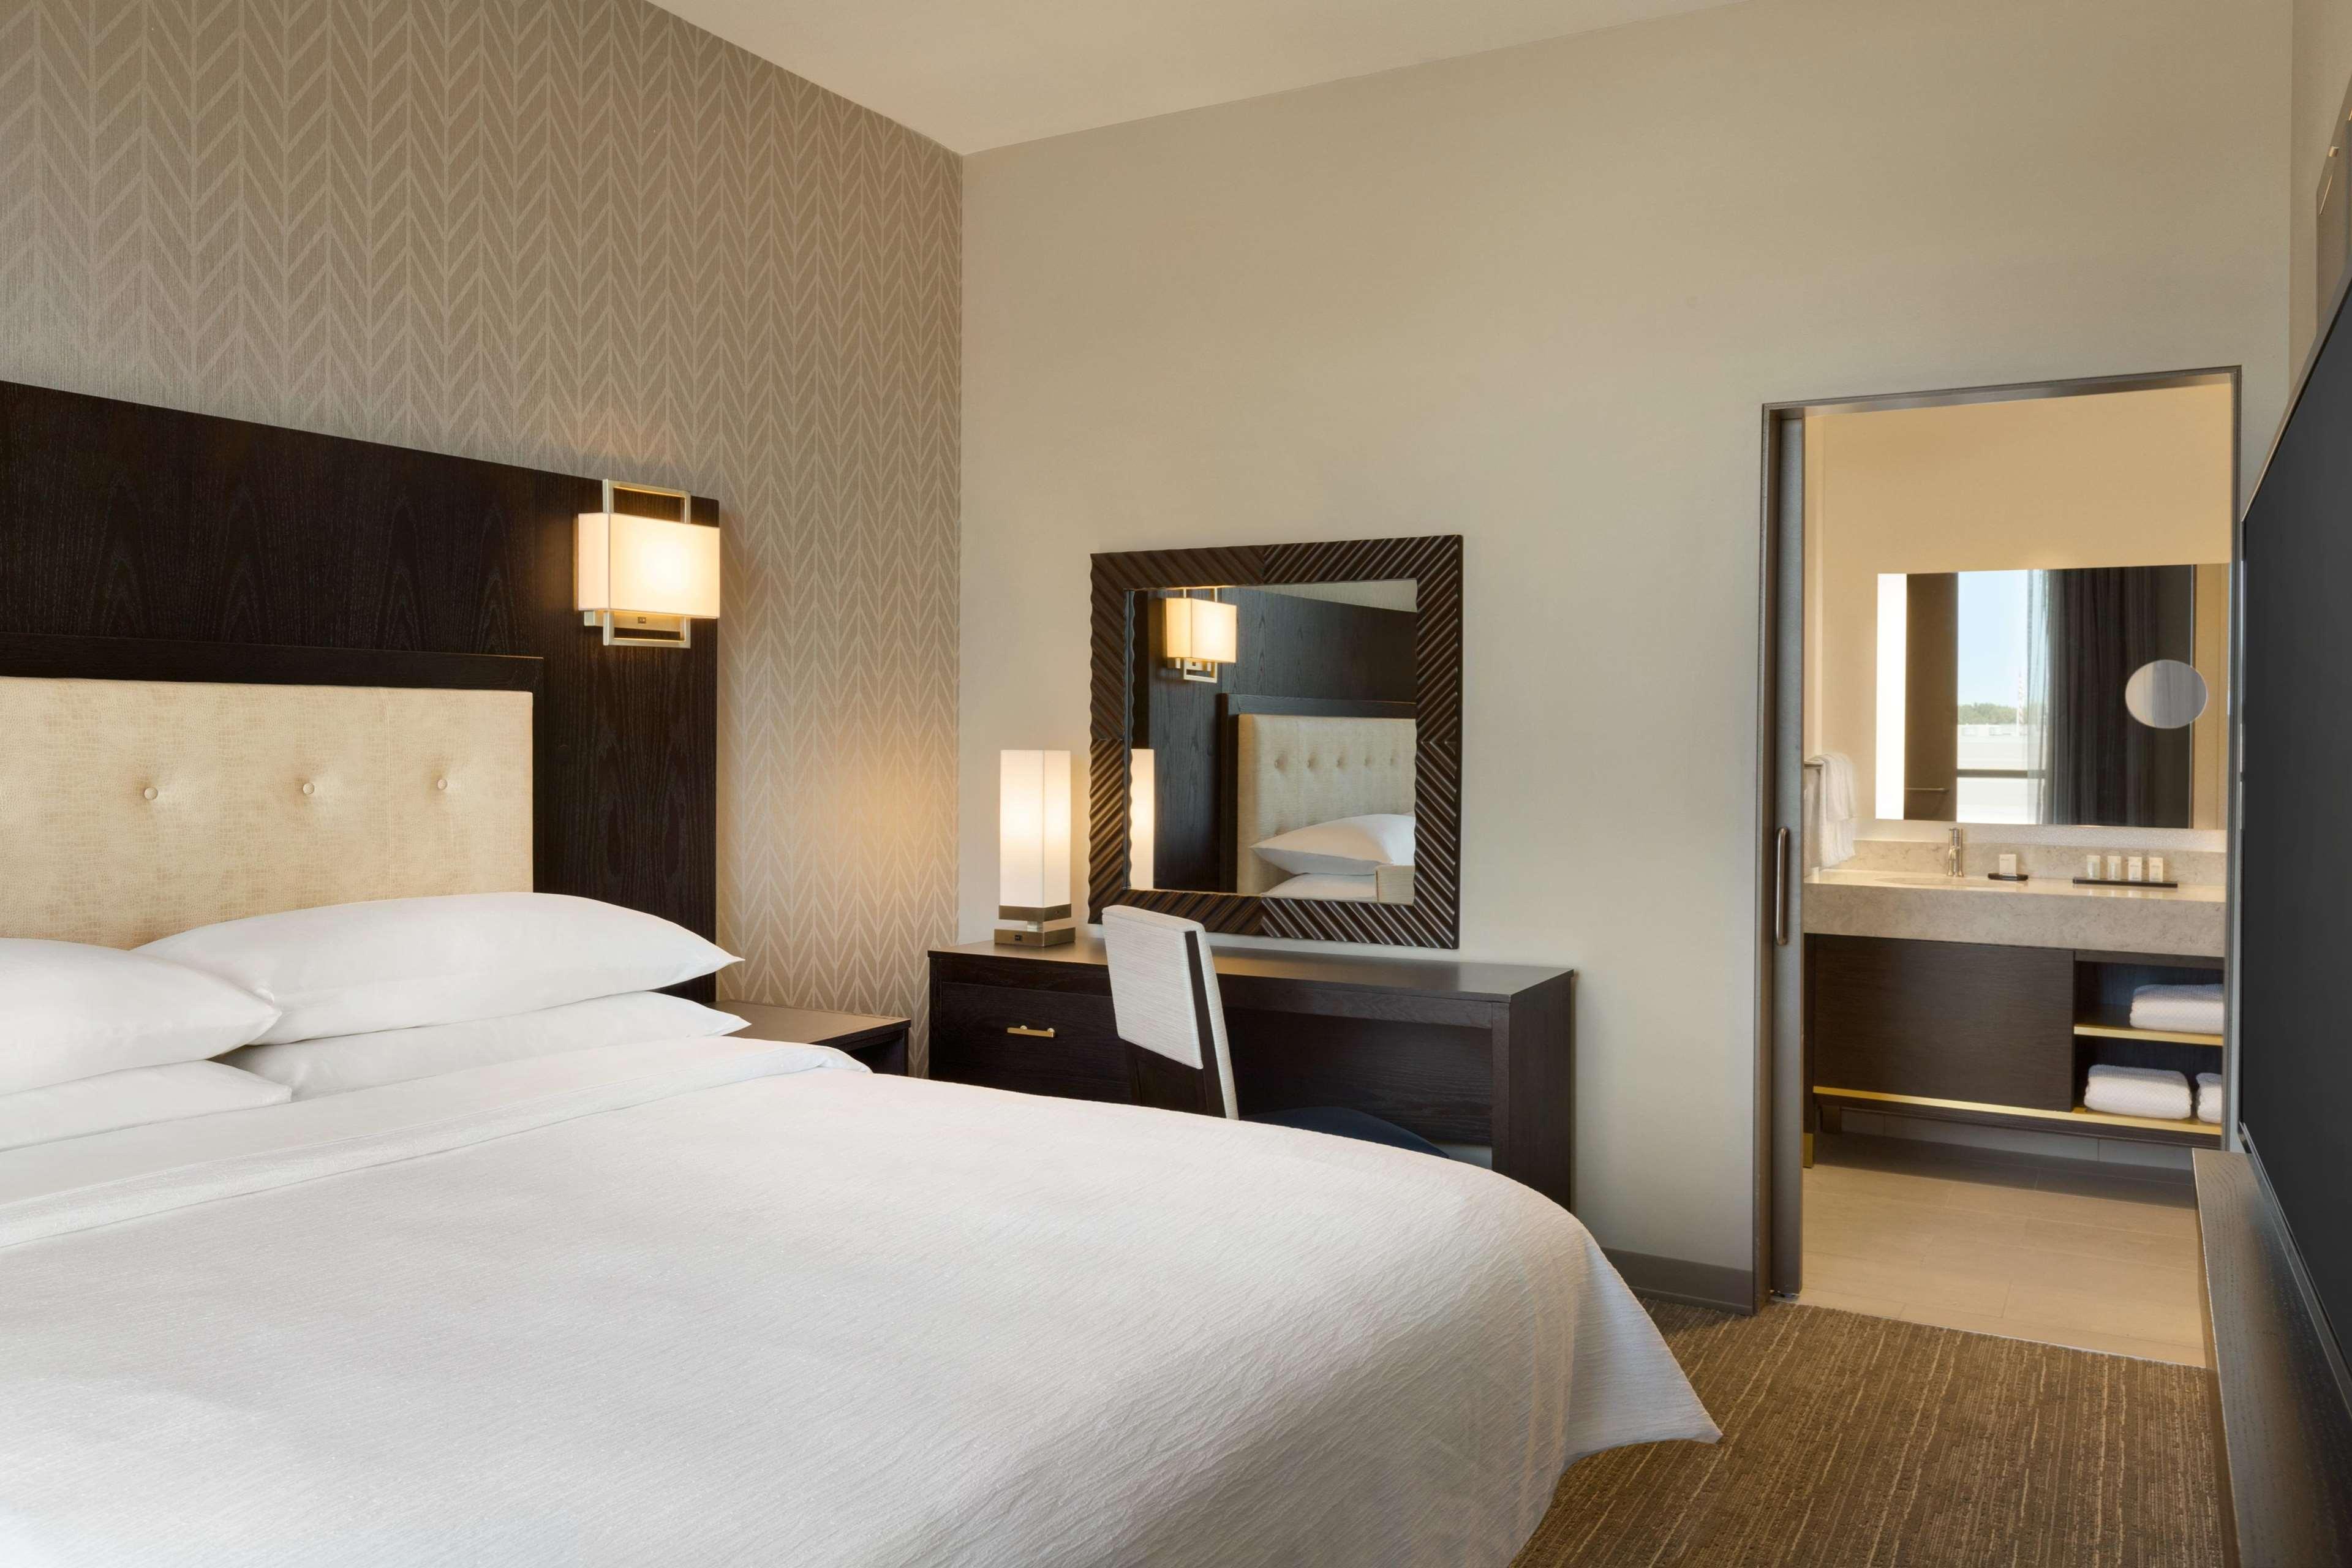 Embassy Suites by Hilton Syracuse Destiny USA image 3